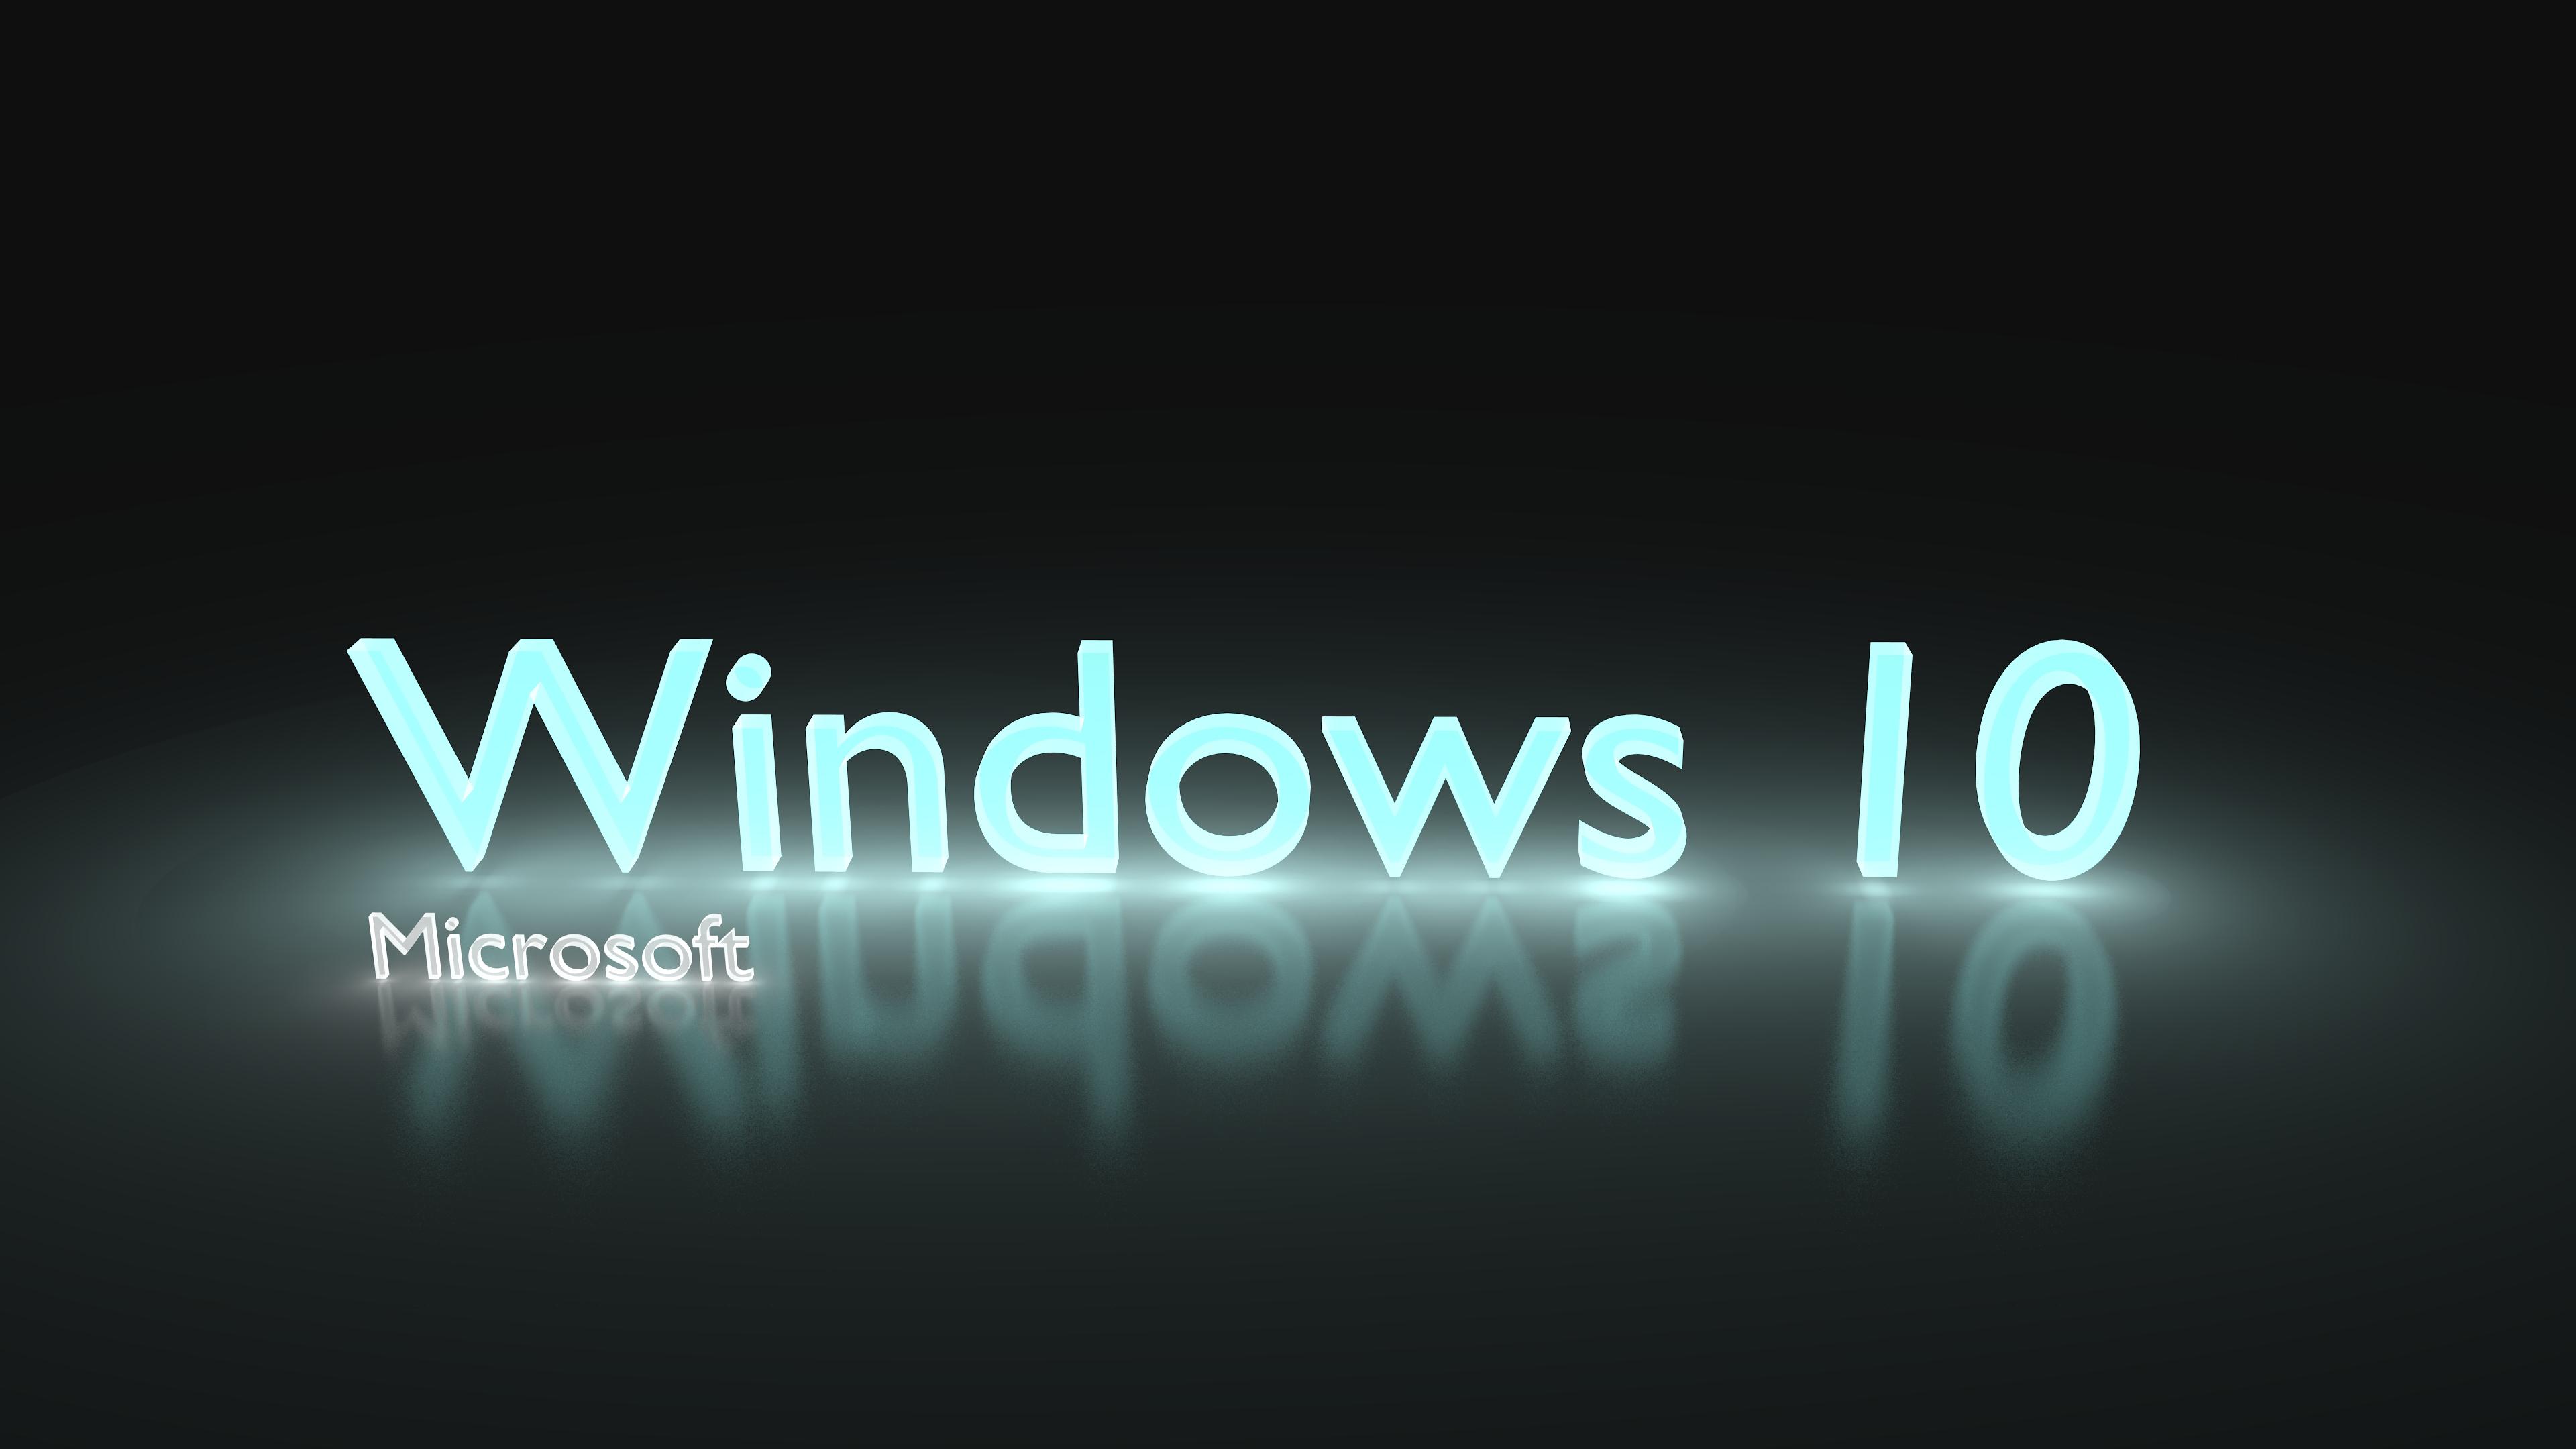 Windows 10 Glowing Light Blue 4k Ultra Papel De Parede HD